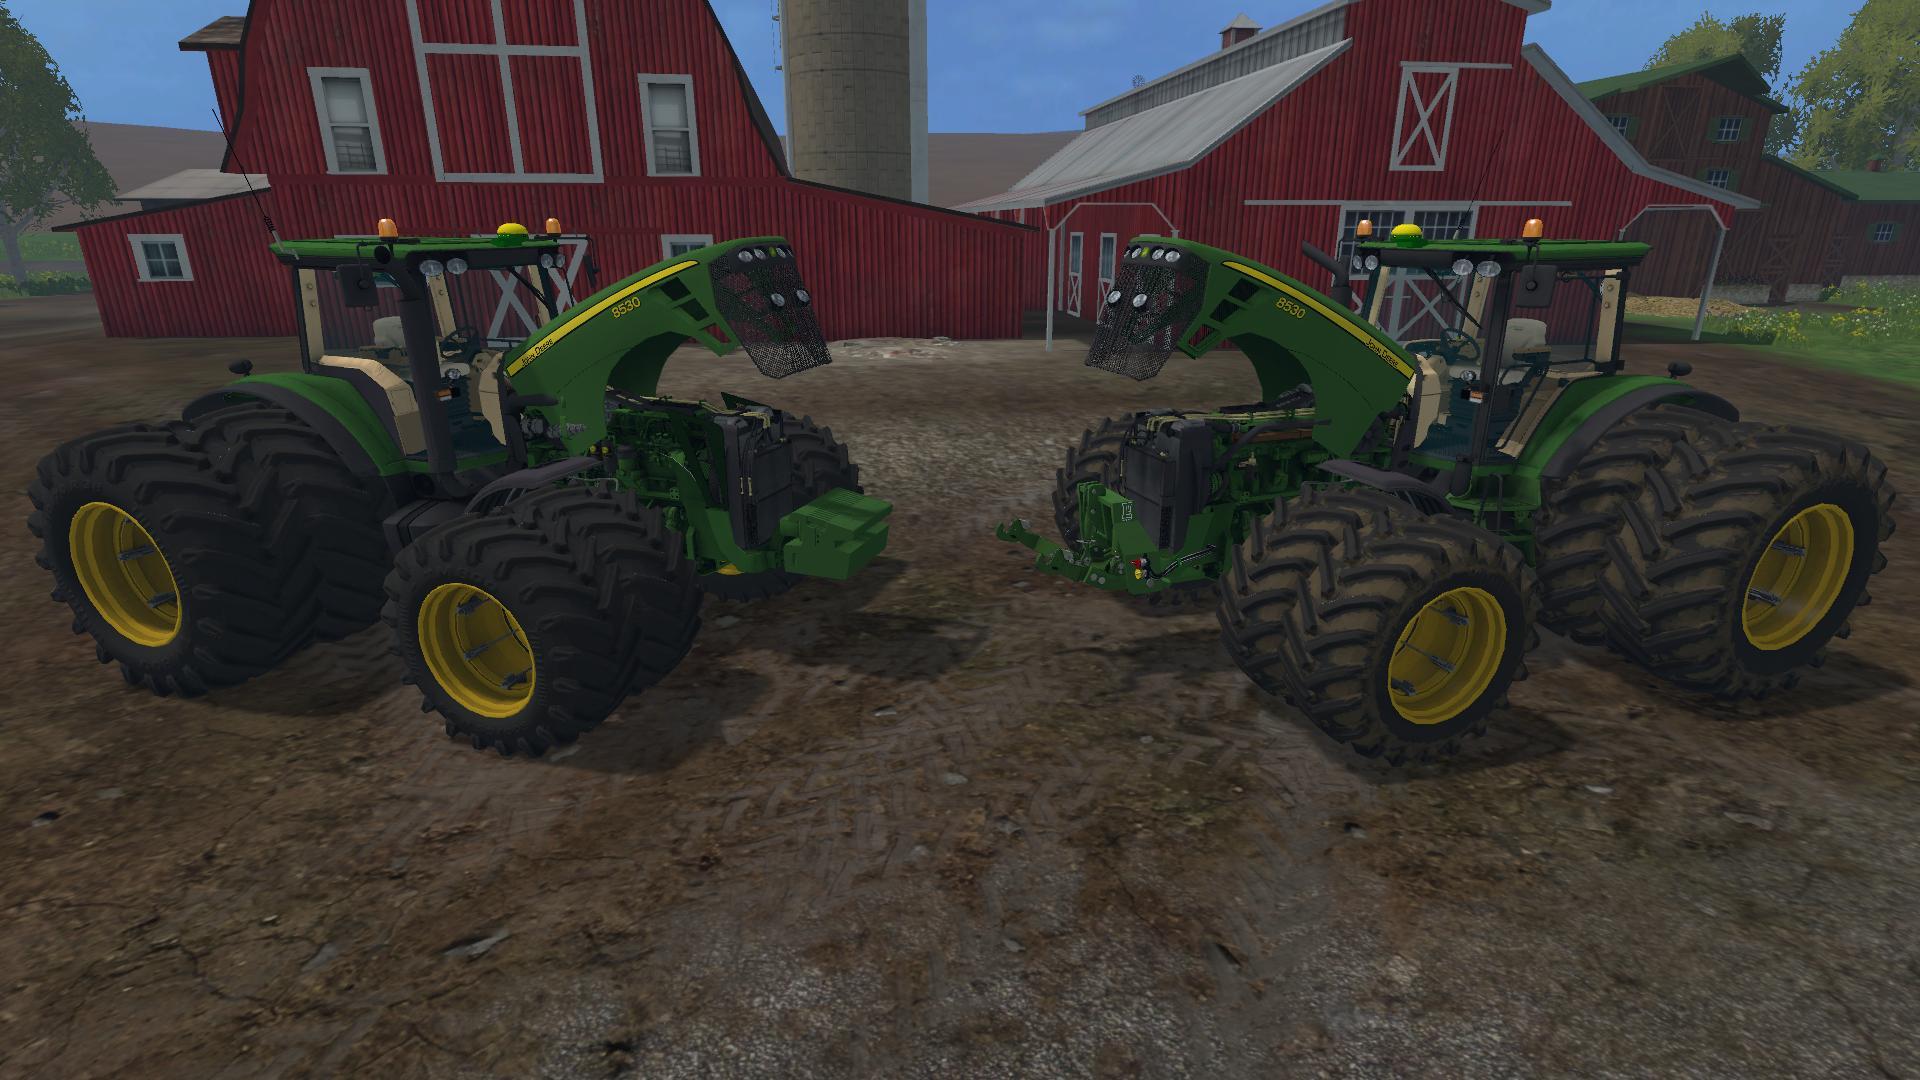 Farming Lady Deere 8530 Eu Tractor V20 Mod Farming Simulator 2015